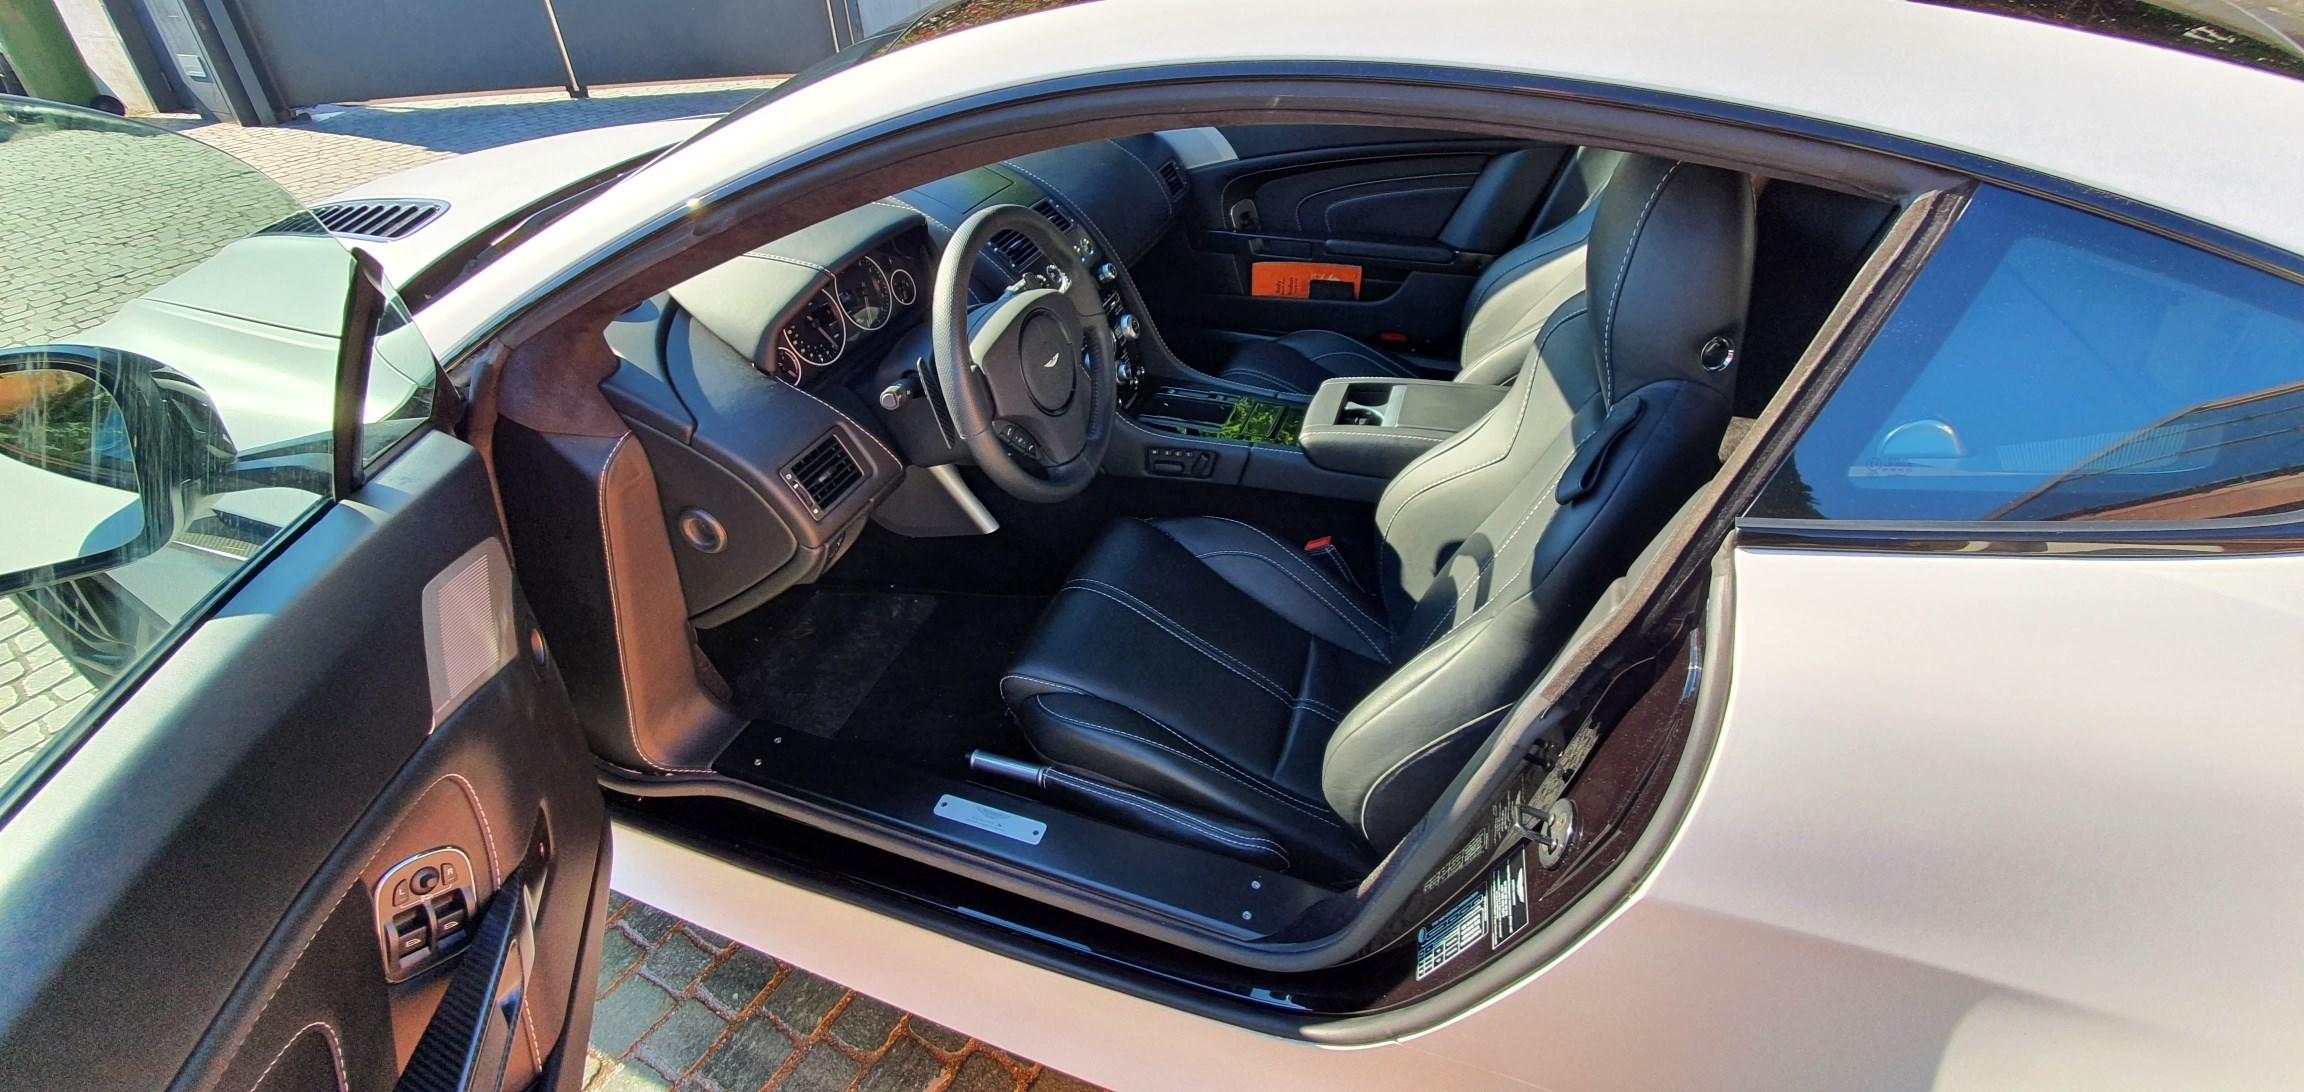 Aston Martin V12 Vantage Coupé 6.0 S Sportshift